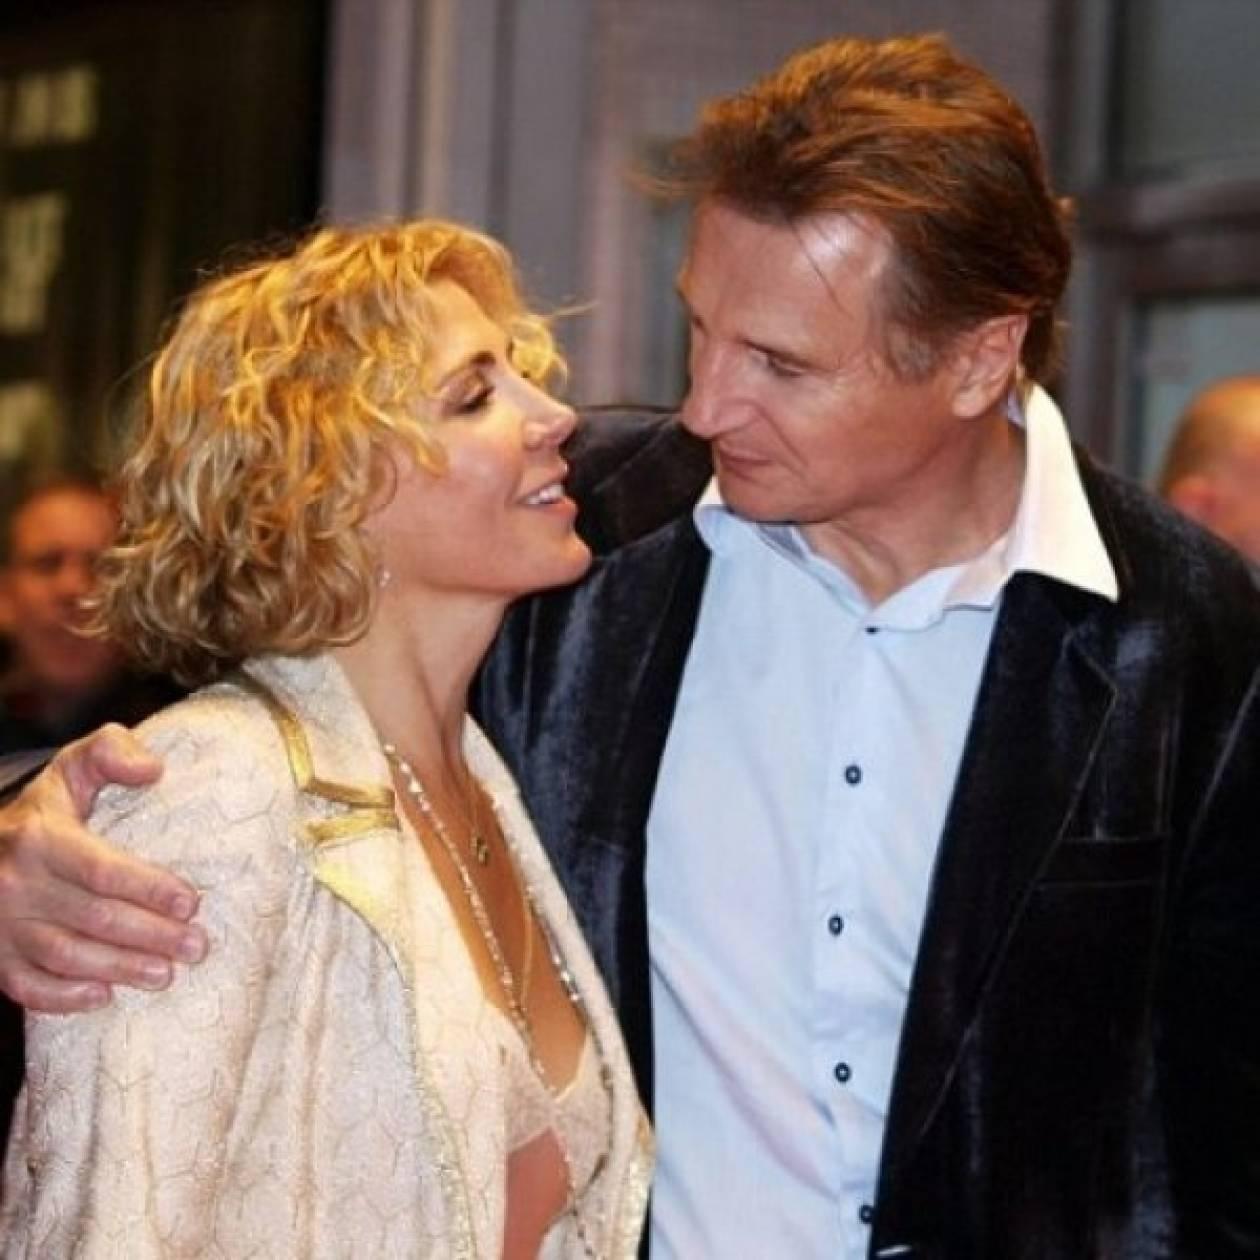 O Liam Neeson συγκλονίζει μιλώντας για το χαμό της γυναίκας του